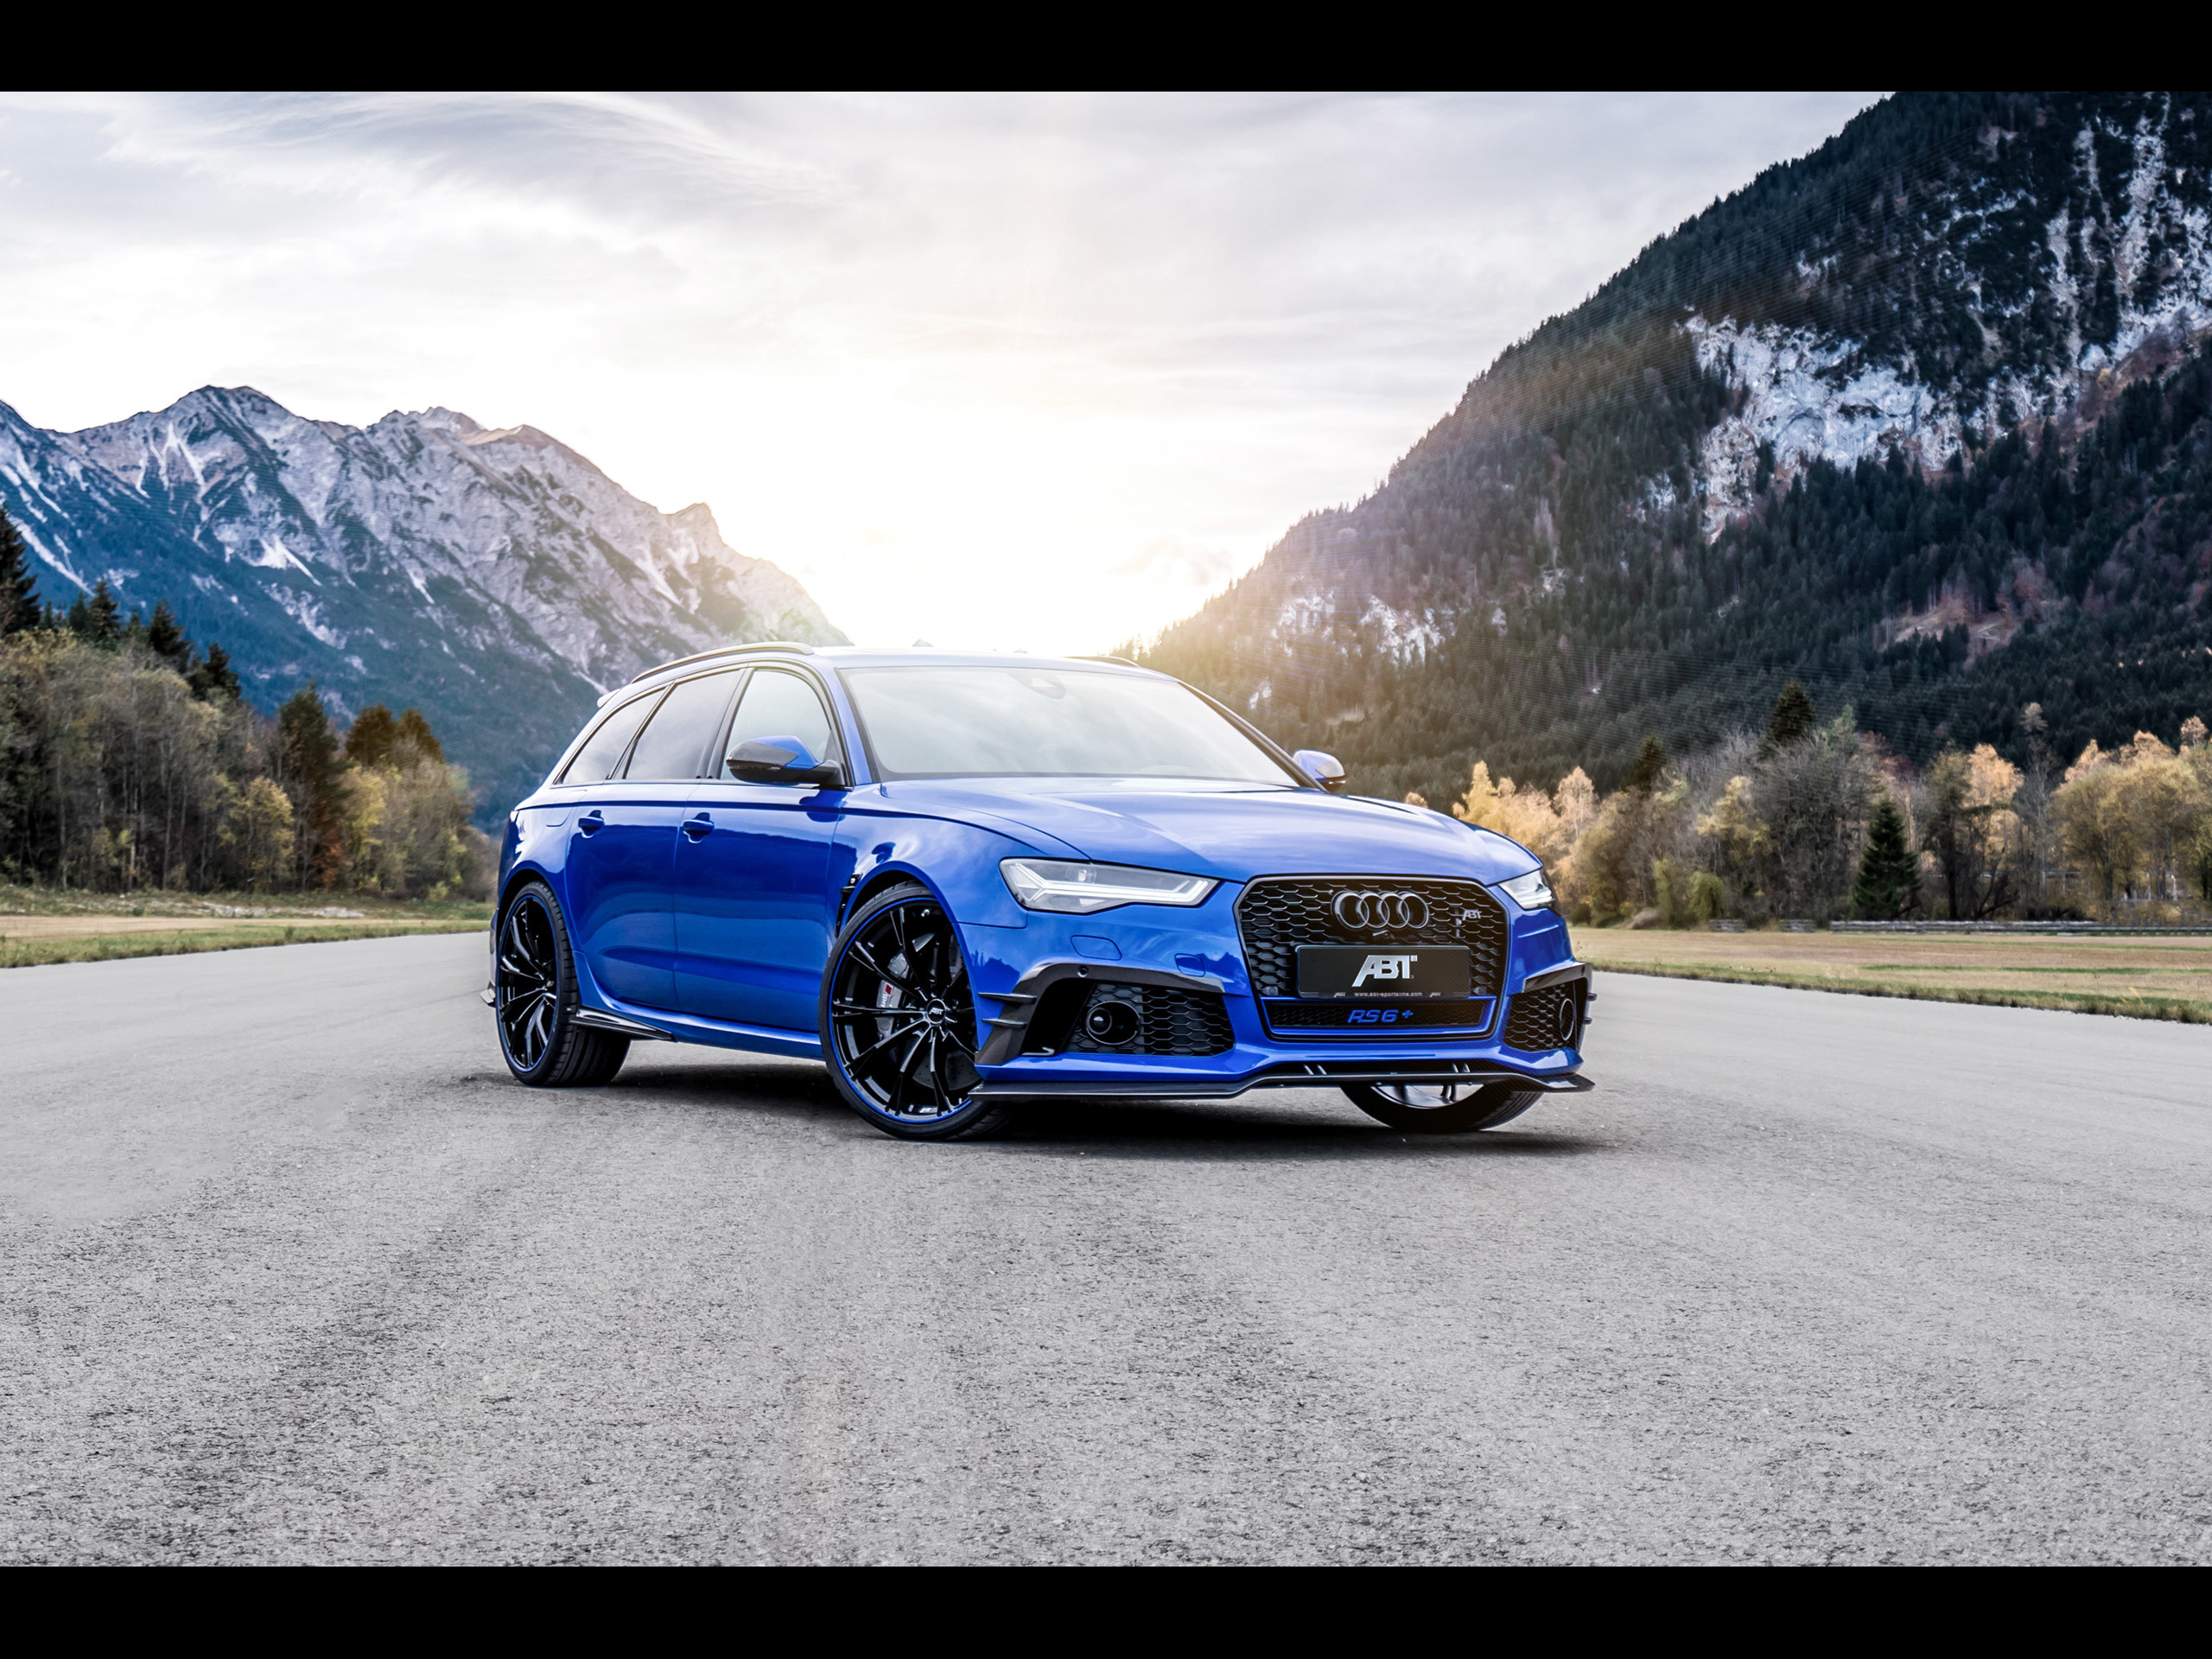 ABT Sportsline Audi RS6+ quot;Nogaro Editionquot; [2018]  アウディに嵌まる  壁紙画像ブログ